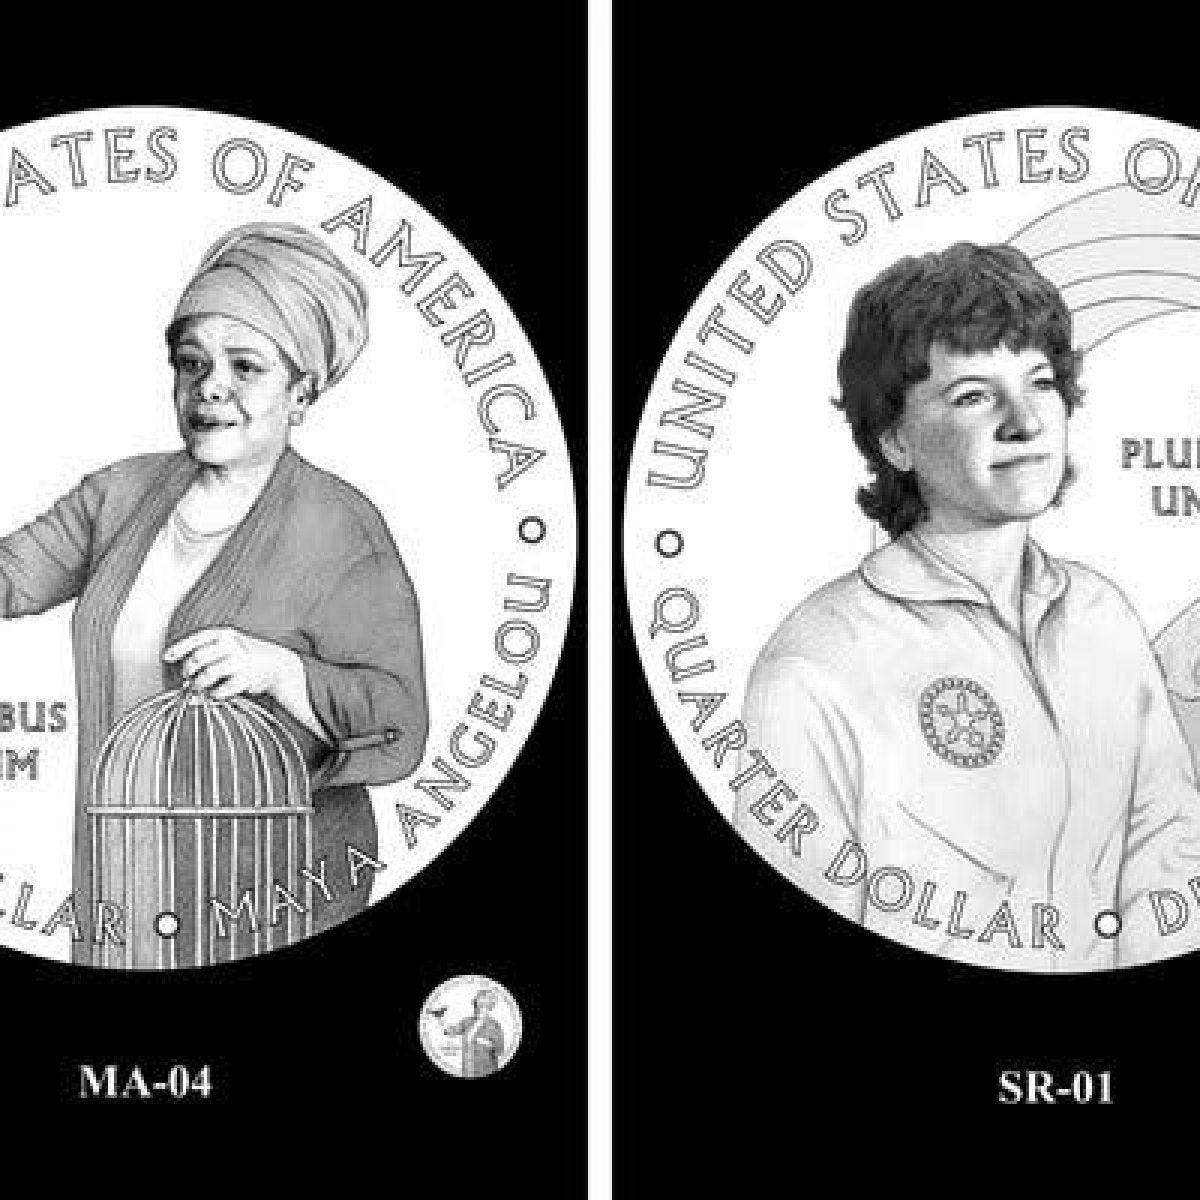 Maya Angelou Among Trailblazing Women To Appear on Newly Designed Quarter